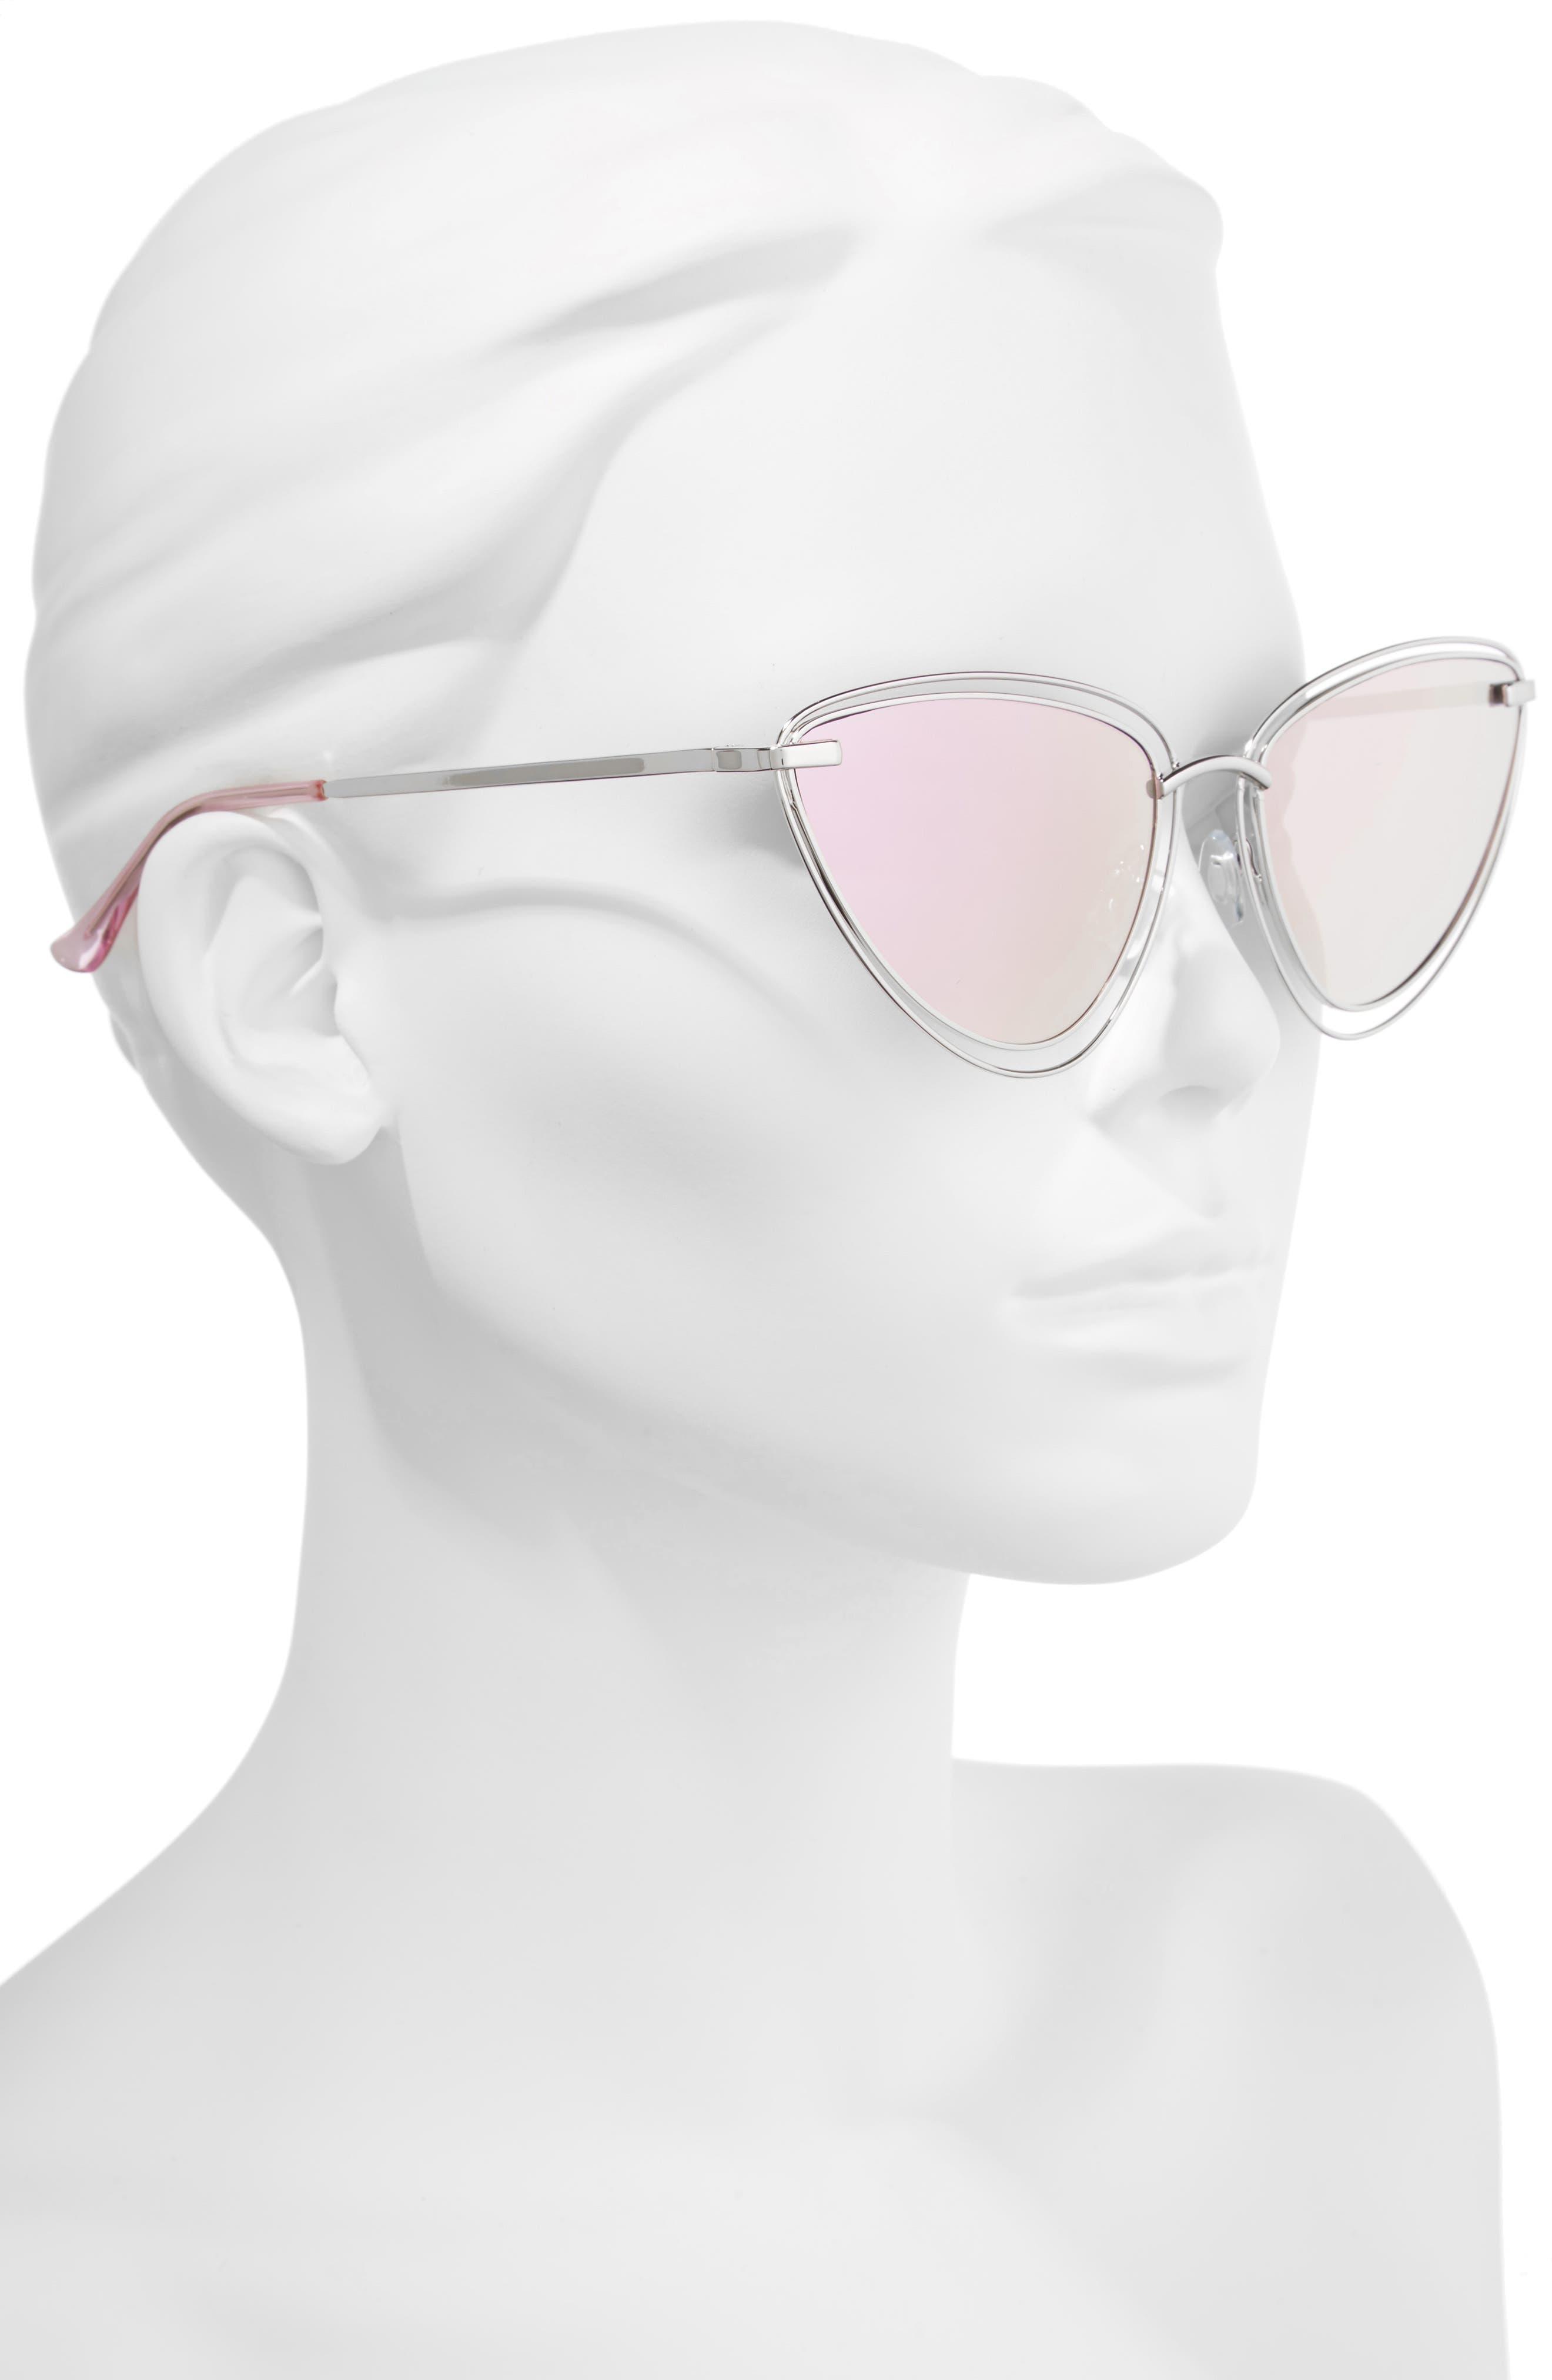 55mm Metal Cat Eye Sunglasses,                             Alternate thumbnail 2, color,                             040